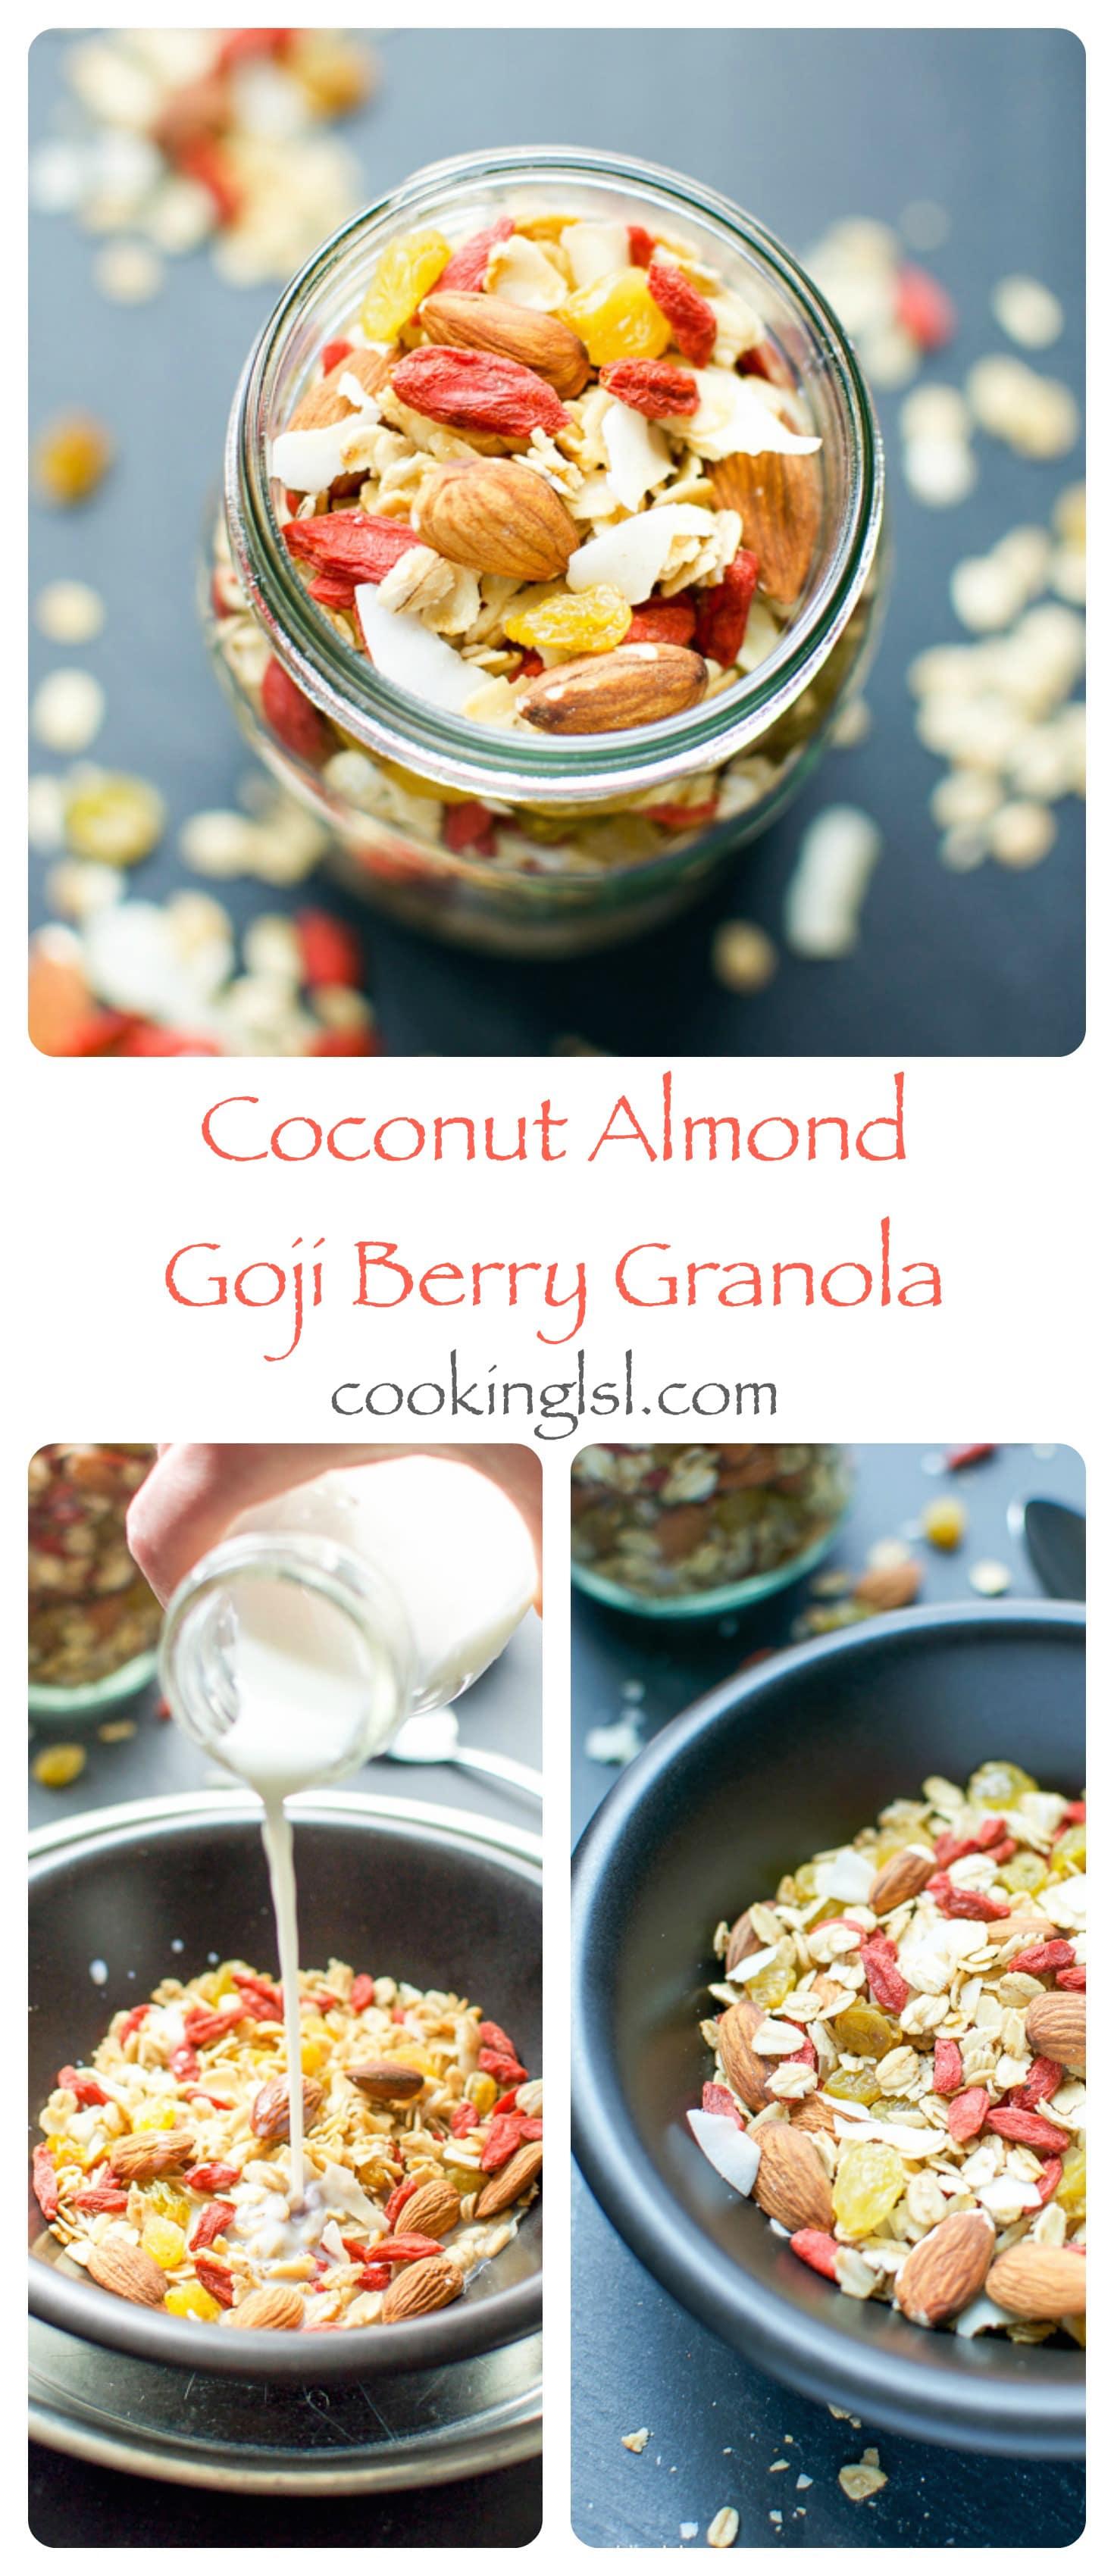 Coconut-Almond-Goji-Berry-Granola